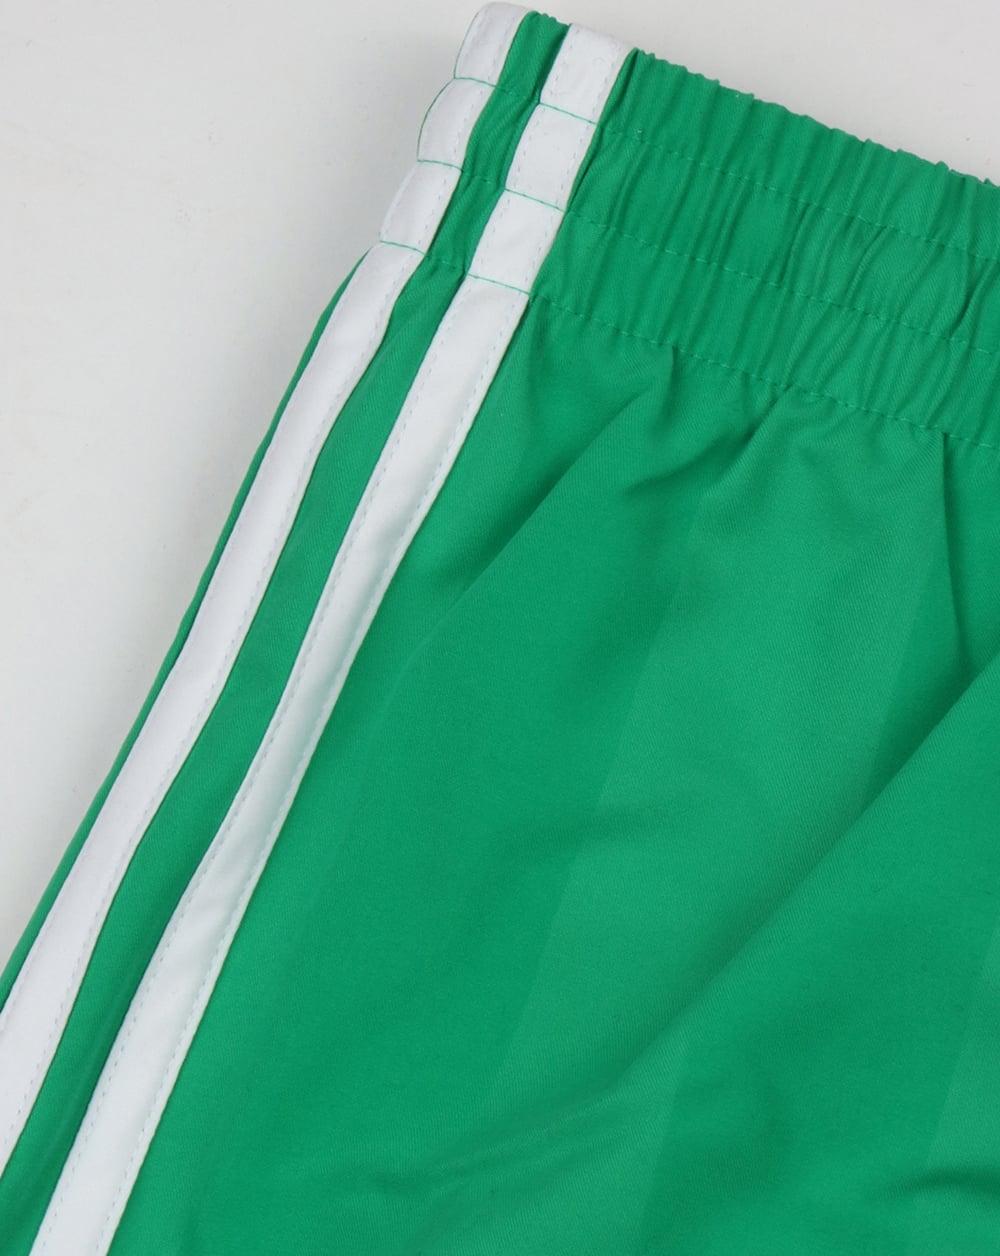 63f63b14f Adidas Originals Football Shorts Core Green,retro,shiny,polyester,mens